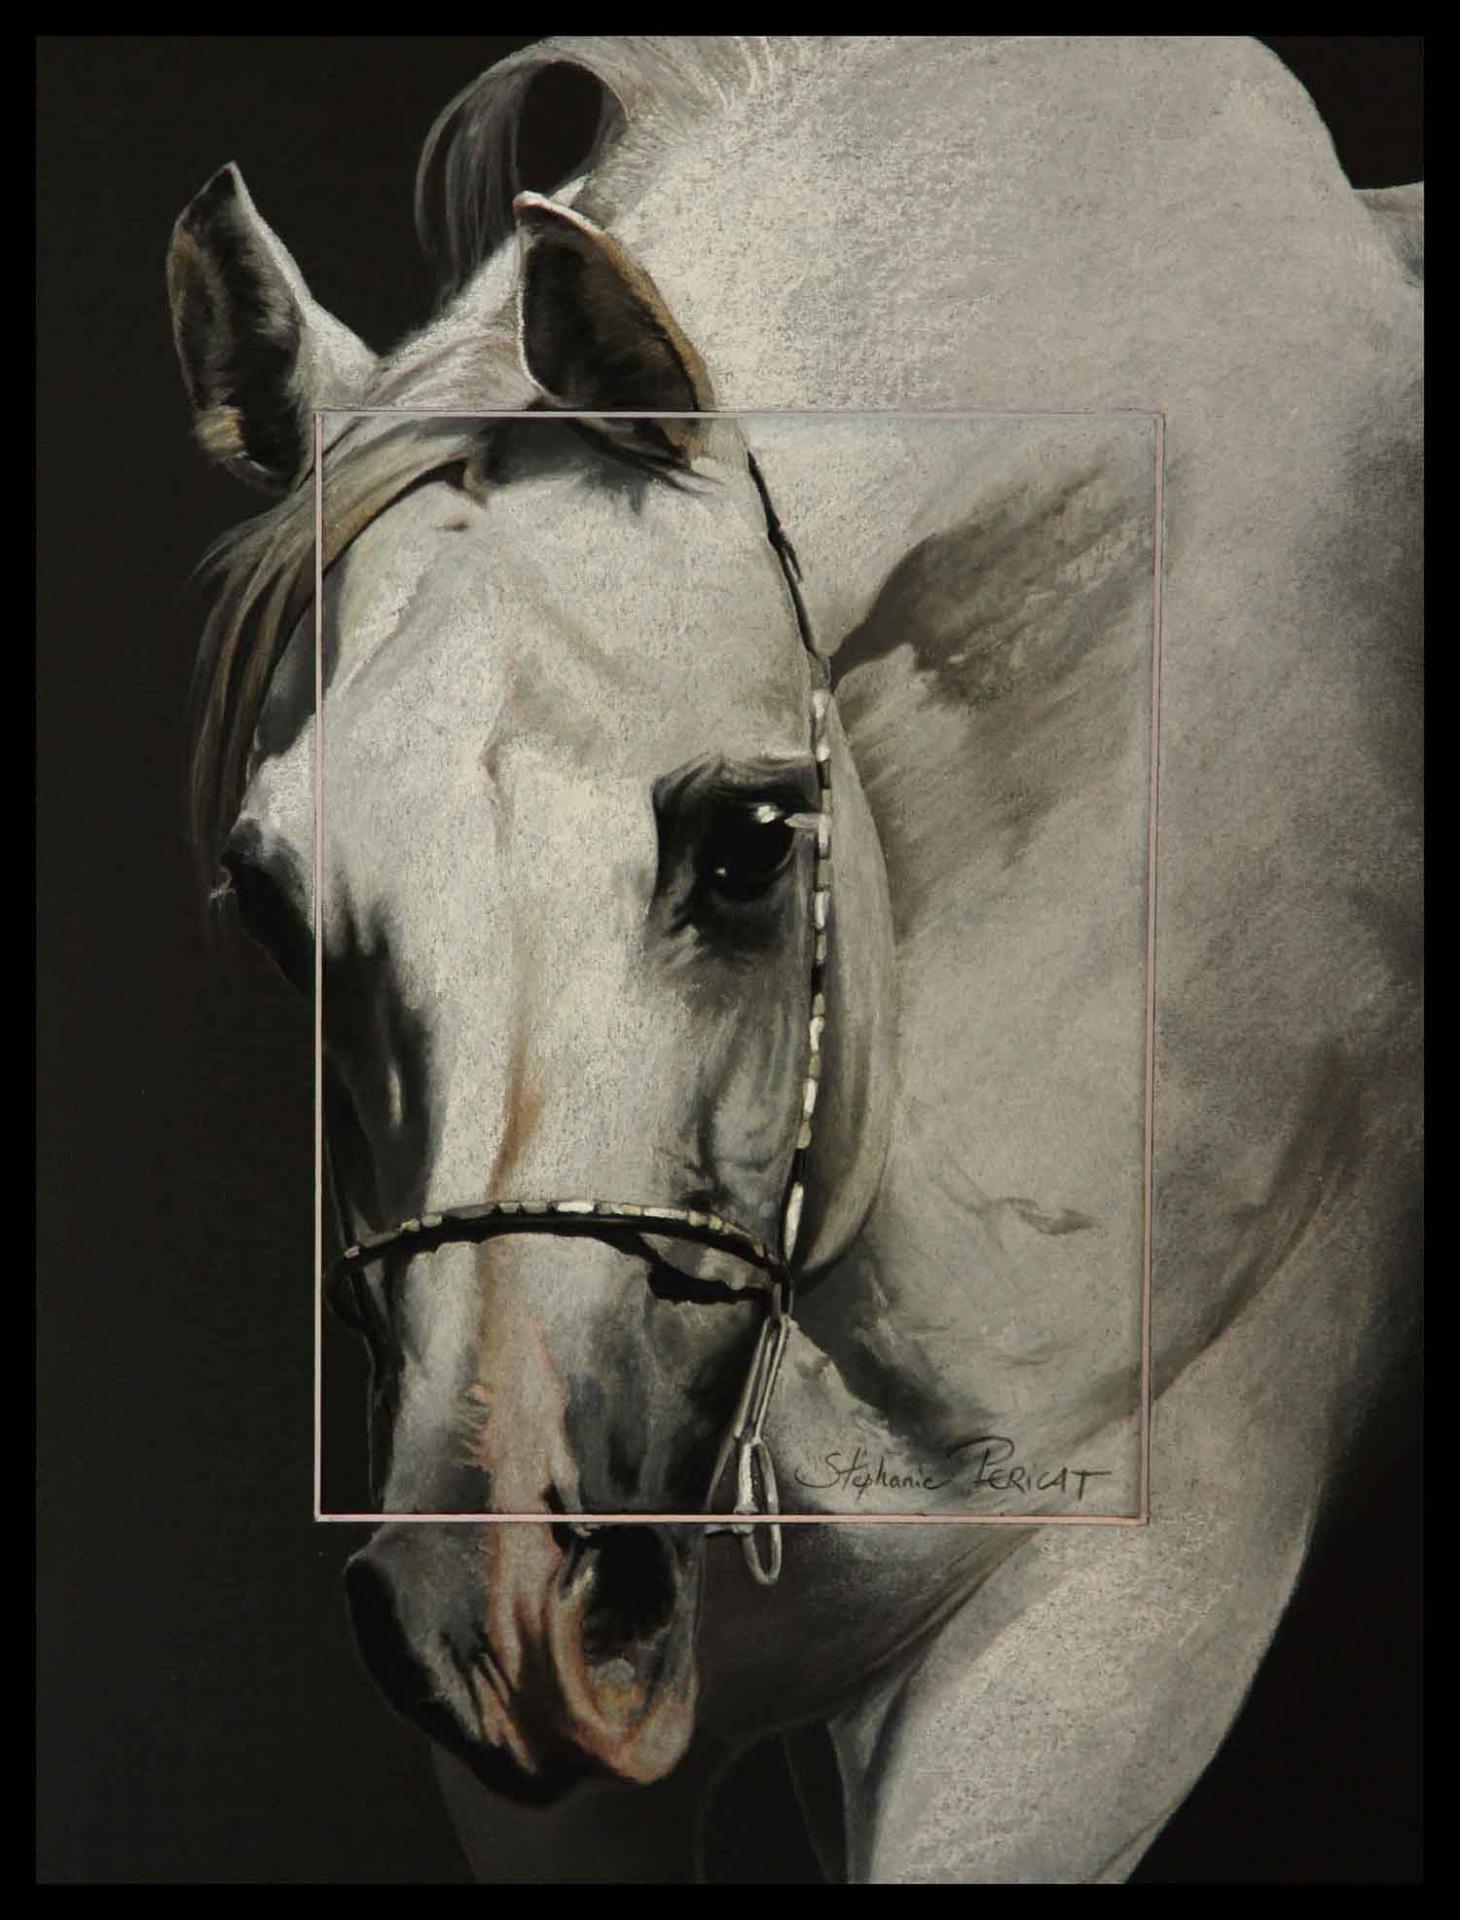 Amoroso de Salvadora, étalon arabe (arabian stallion) - 30x40cm - AV for sale